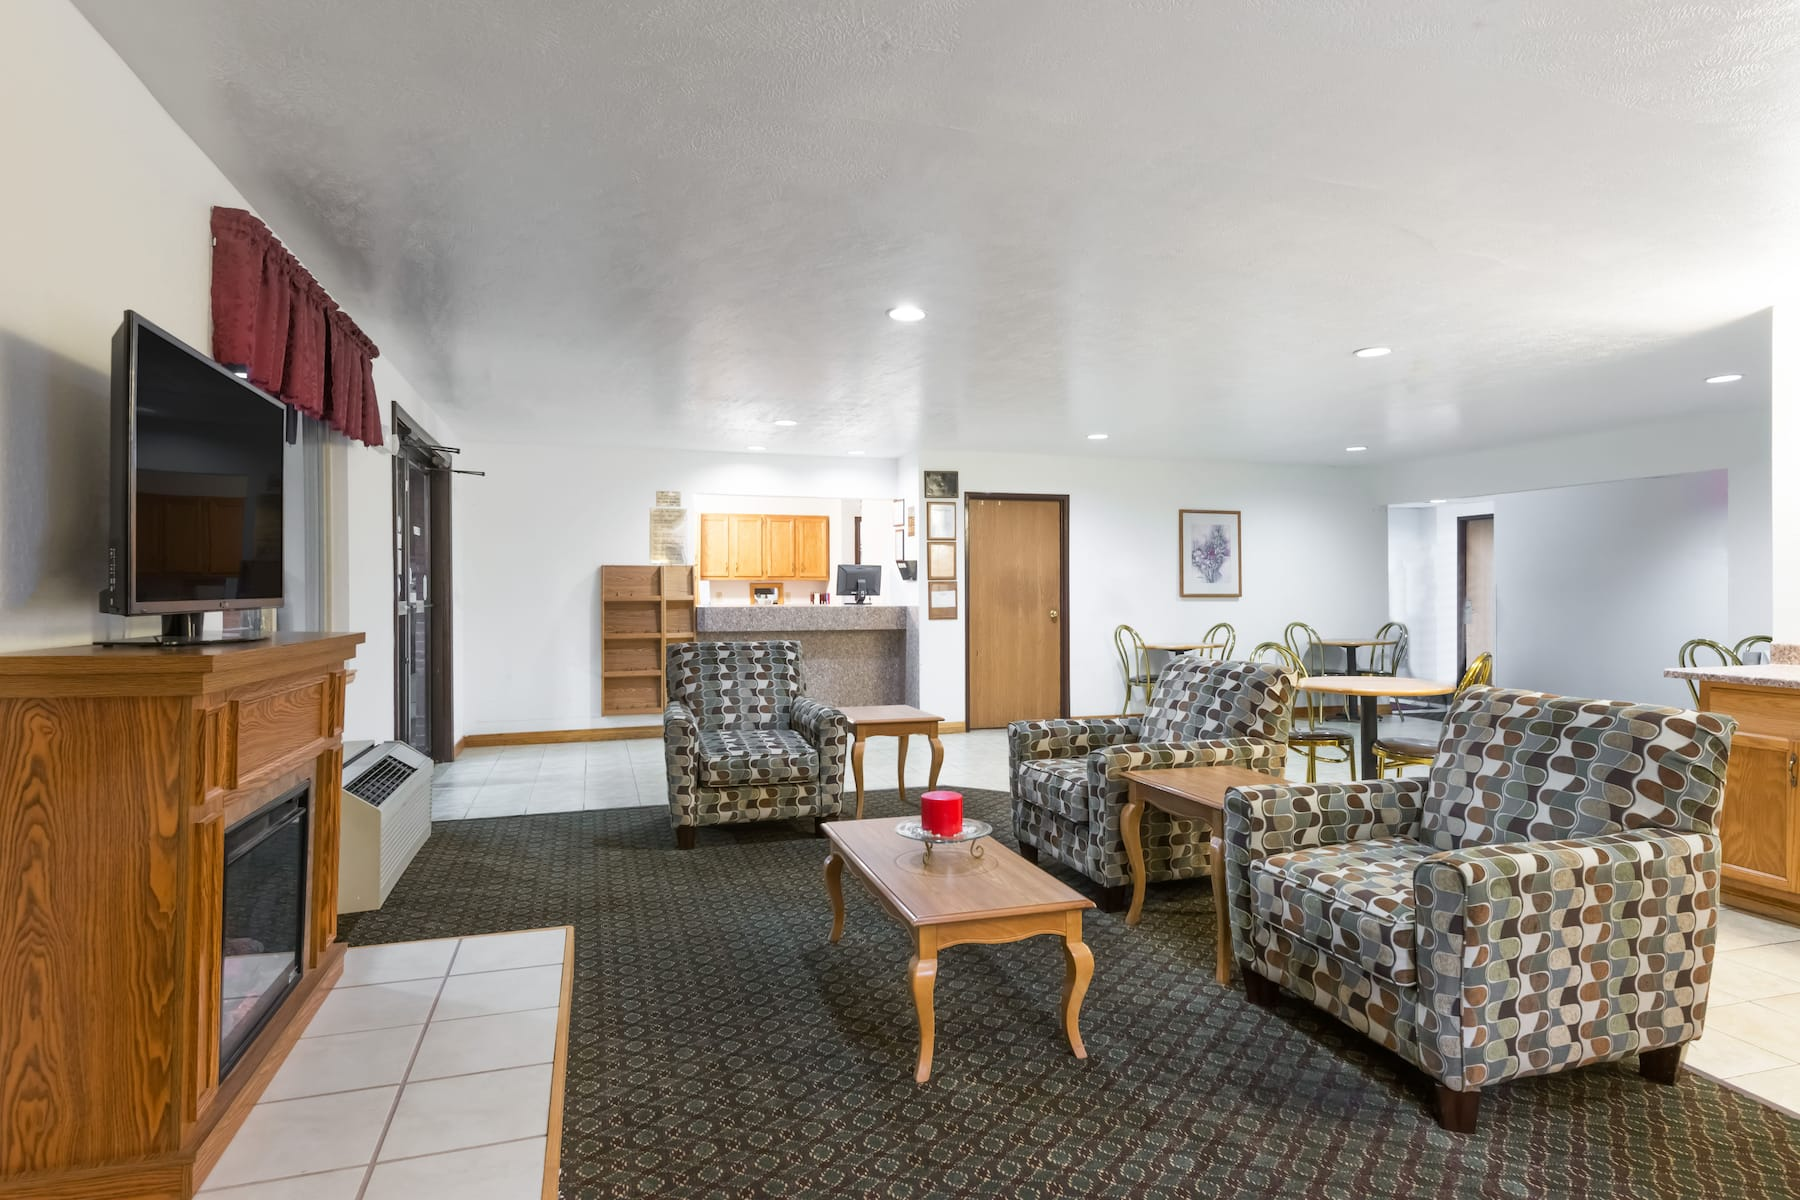 Super 8 By Wyndham Fairmont Fairmont Wv Hotels